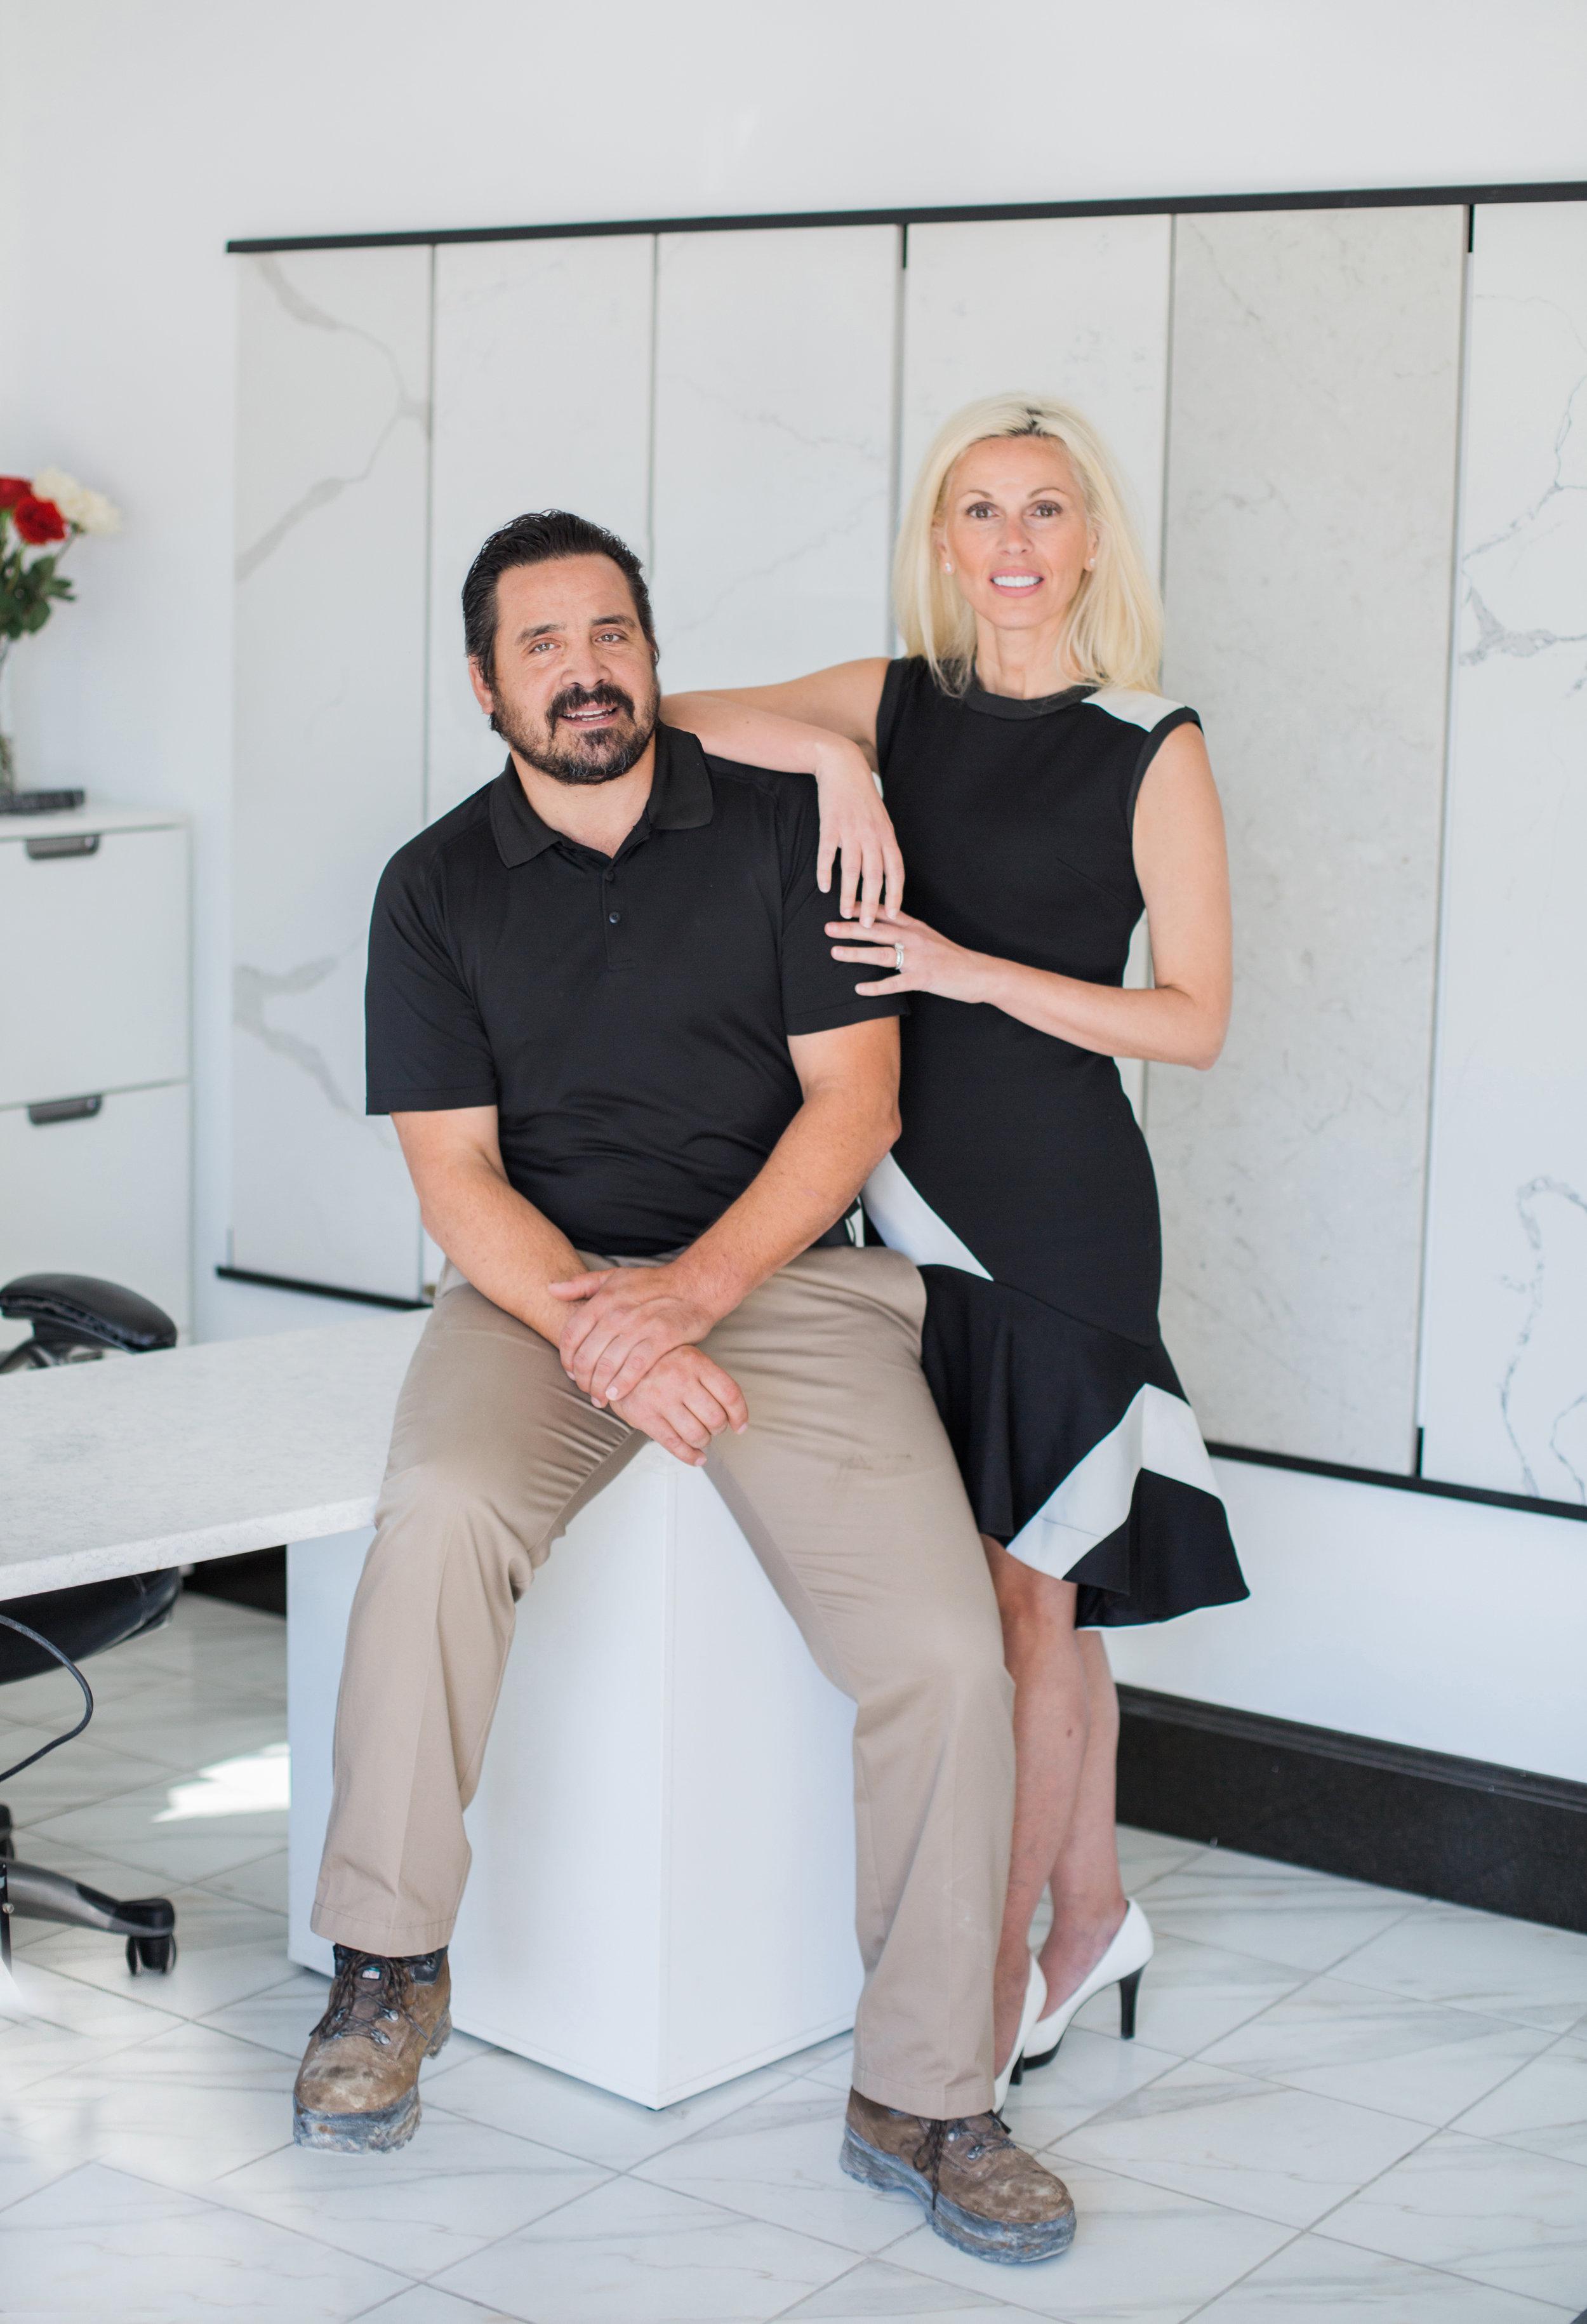 Phil & Anita DiMambro - OWNERS & VP OF SALES+MARKETING